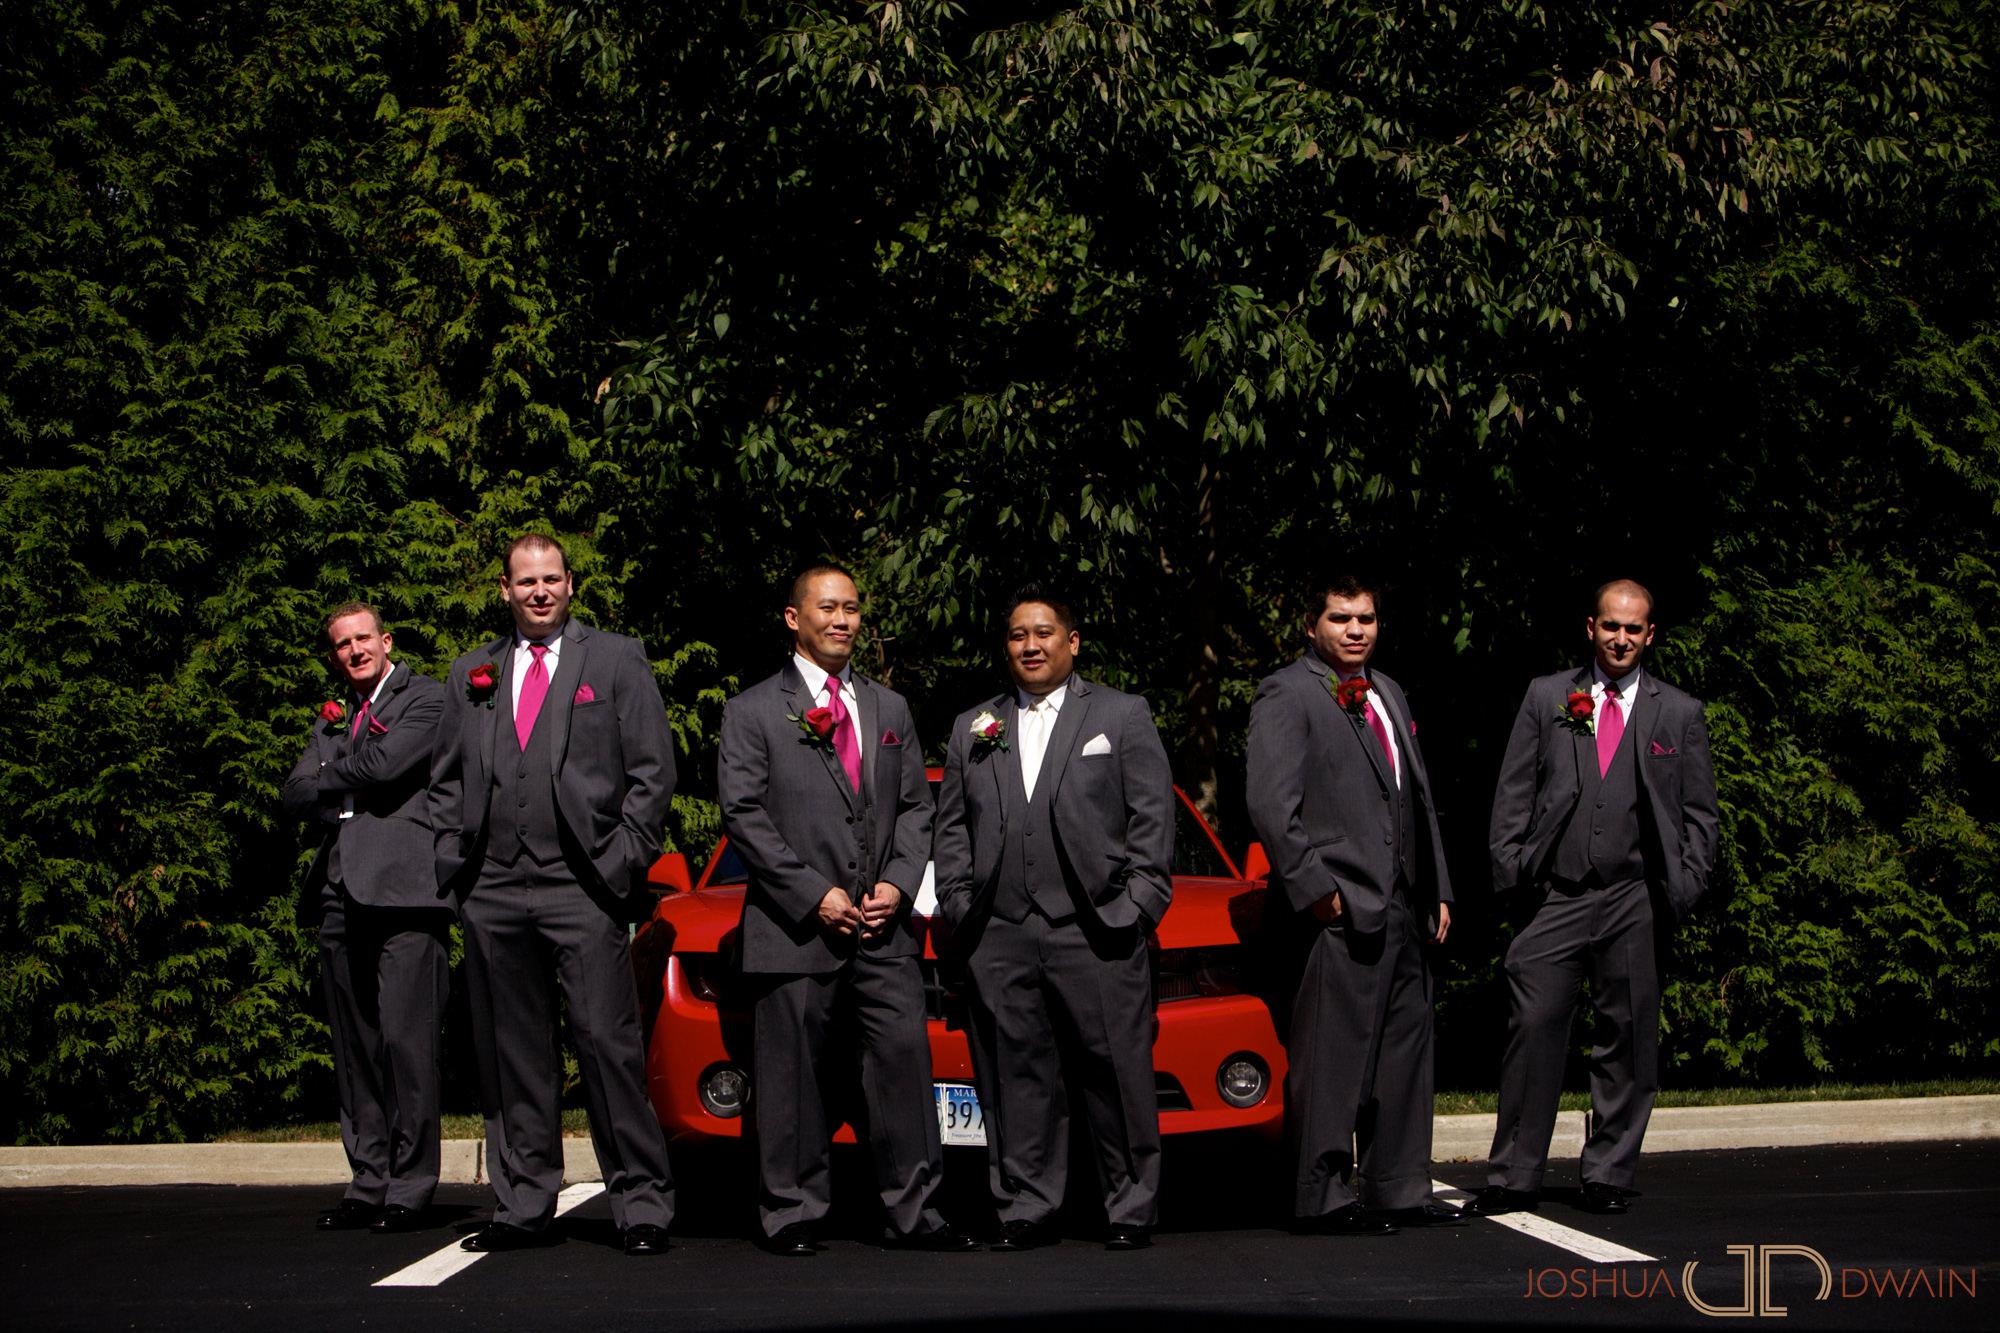 danielle-derek-005-the-imperia-somerset-new-jersey-wedding-photographer-joshua-dwain-danielle-derek-015-the-imperia-somerset-new-jerseywedding-photographer-joshua-dwain-2012-09-15_dd_115